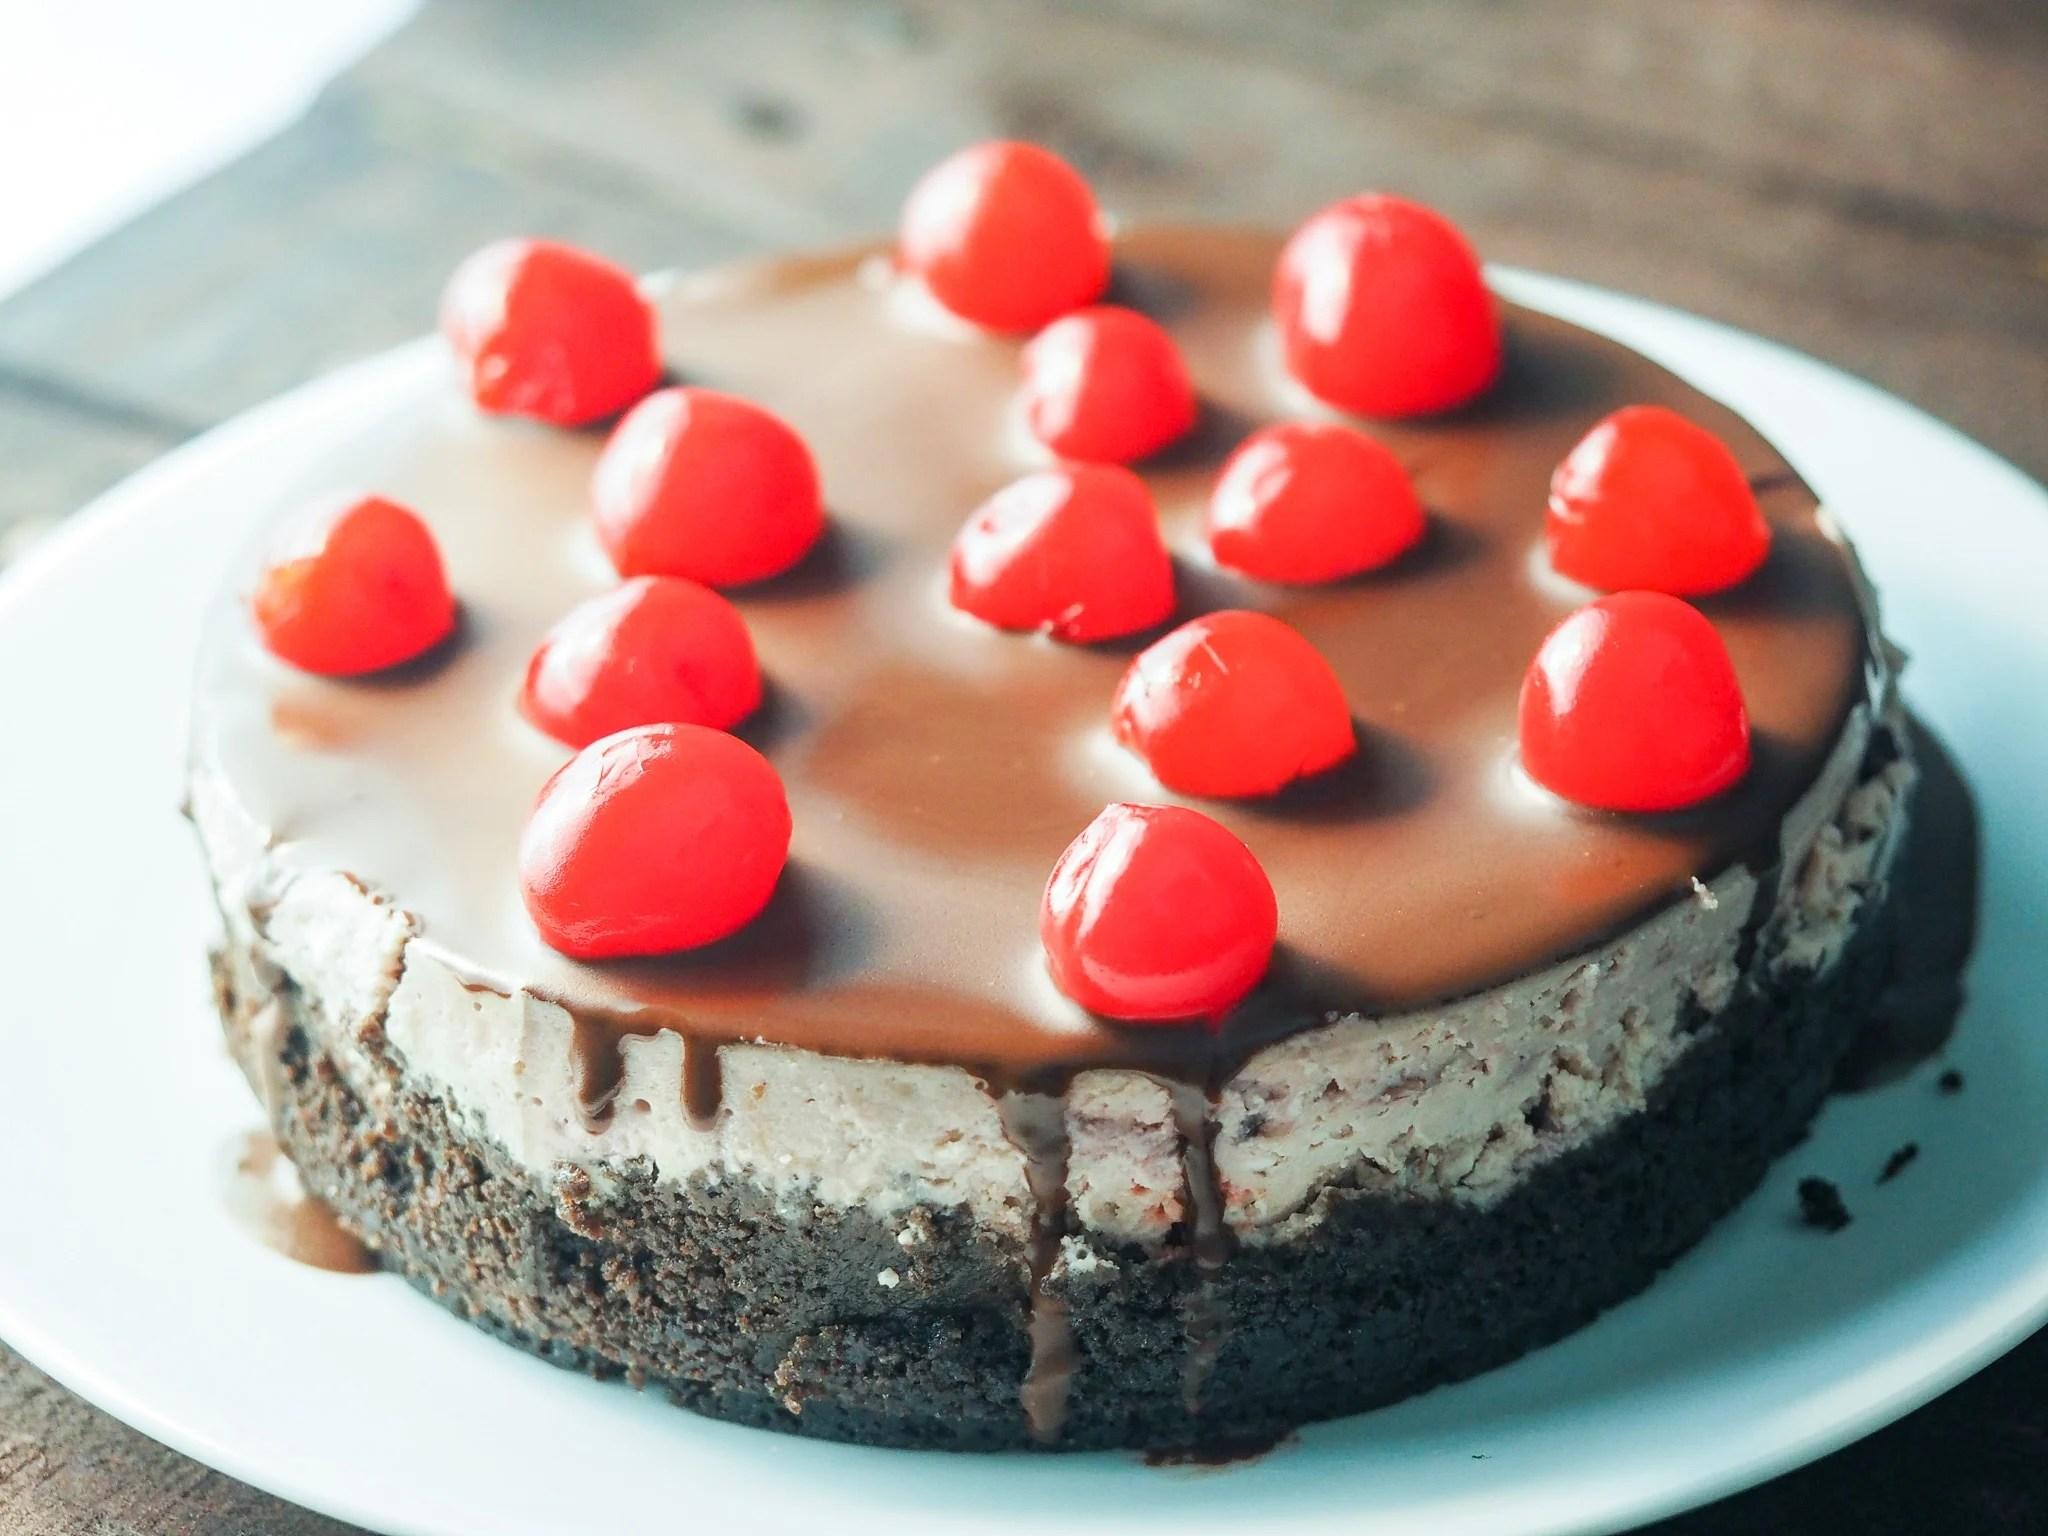 Easy Instant Pot Cherry Chocolate Cheesecake